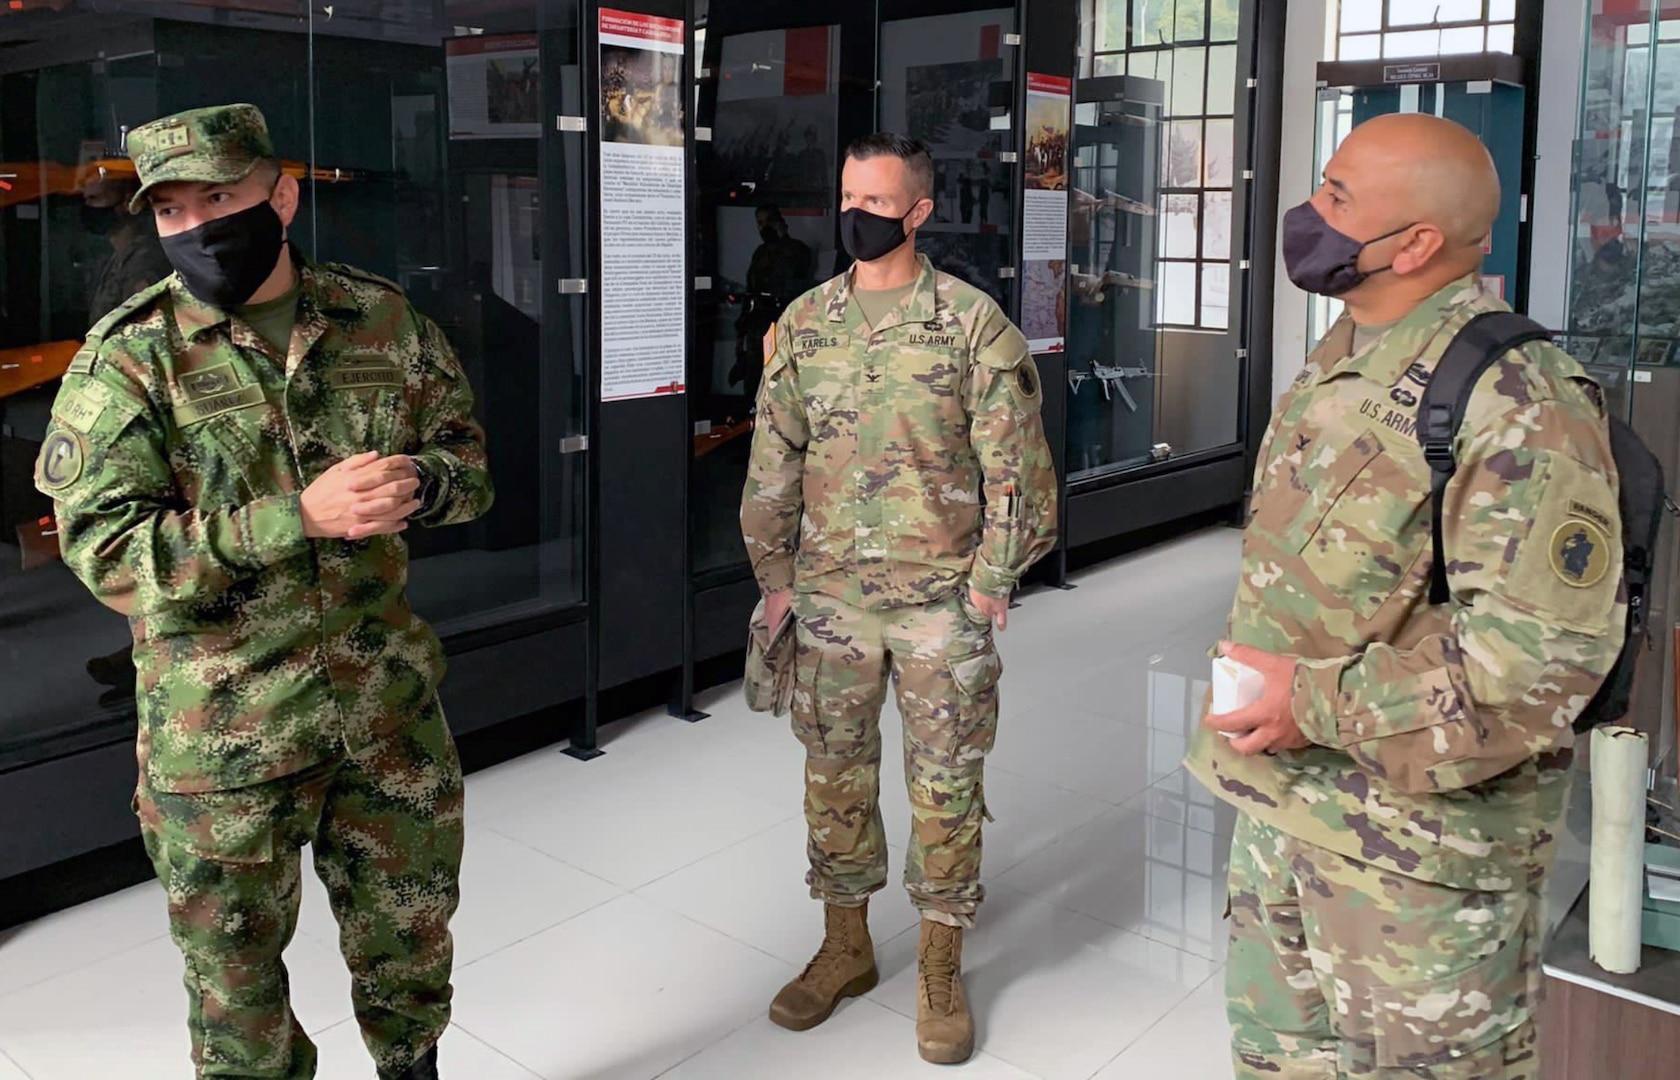 Three men in military uniform stand in hallway